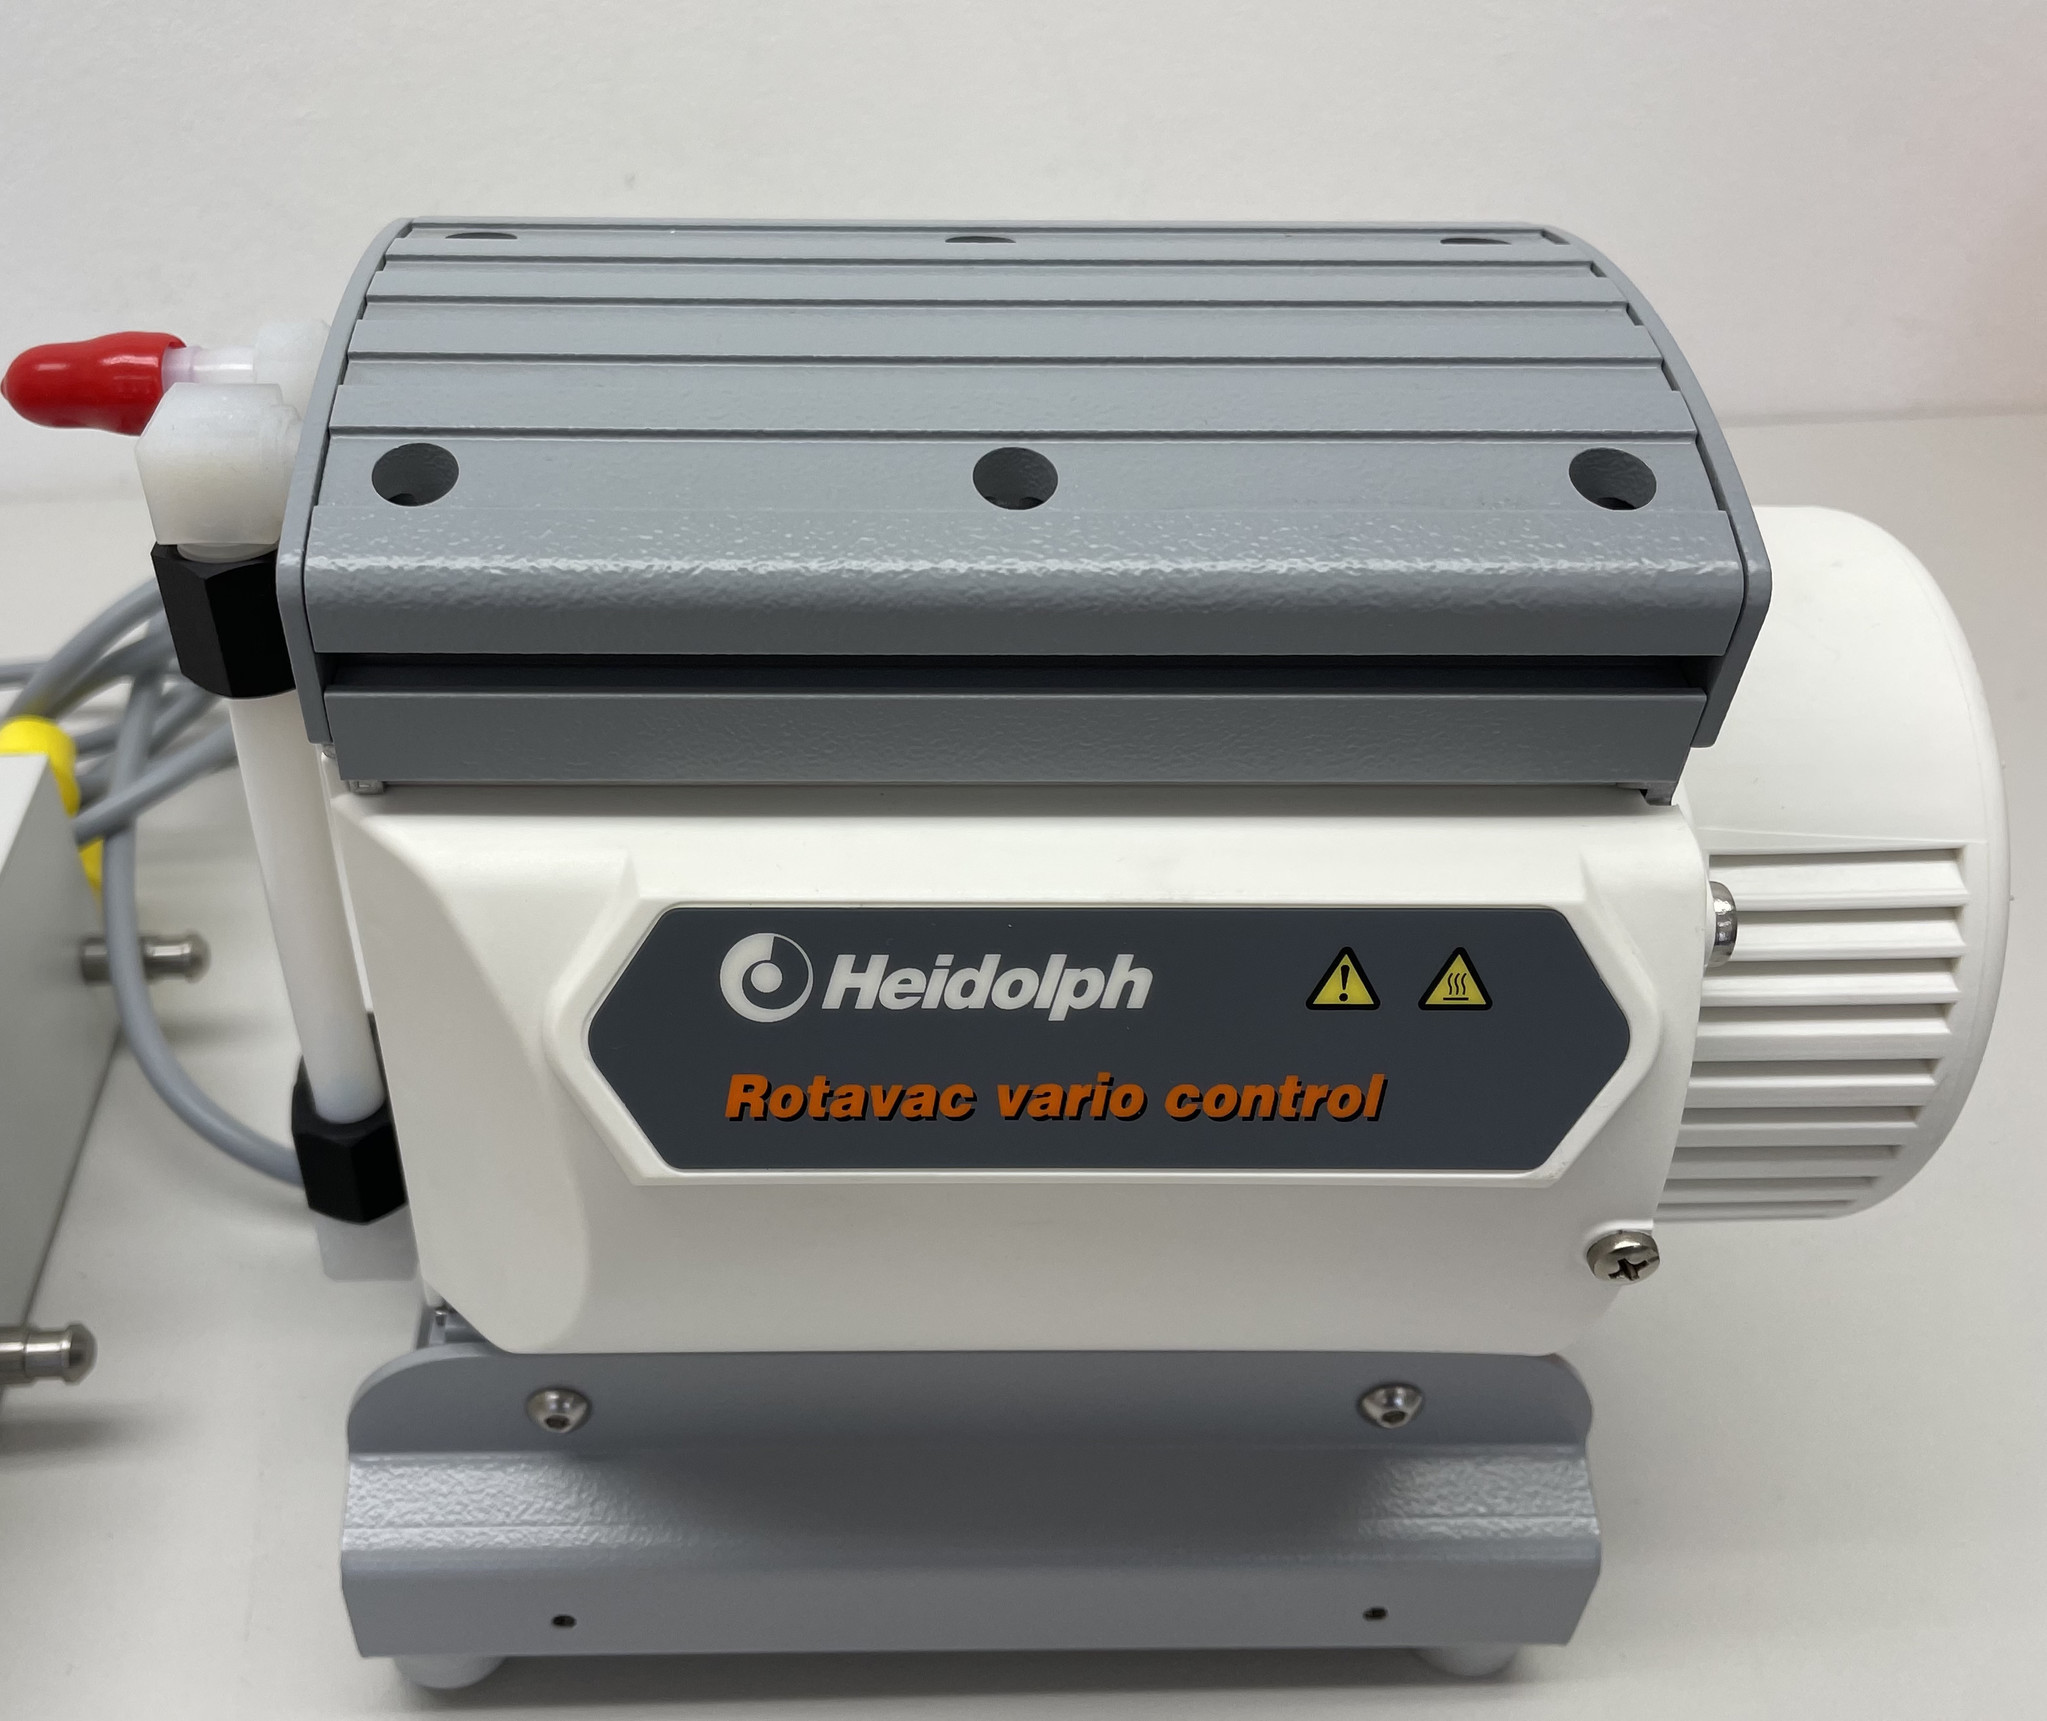 Heidolph Heidolph Rotavac Vario Control